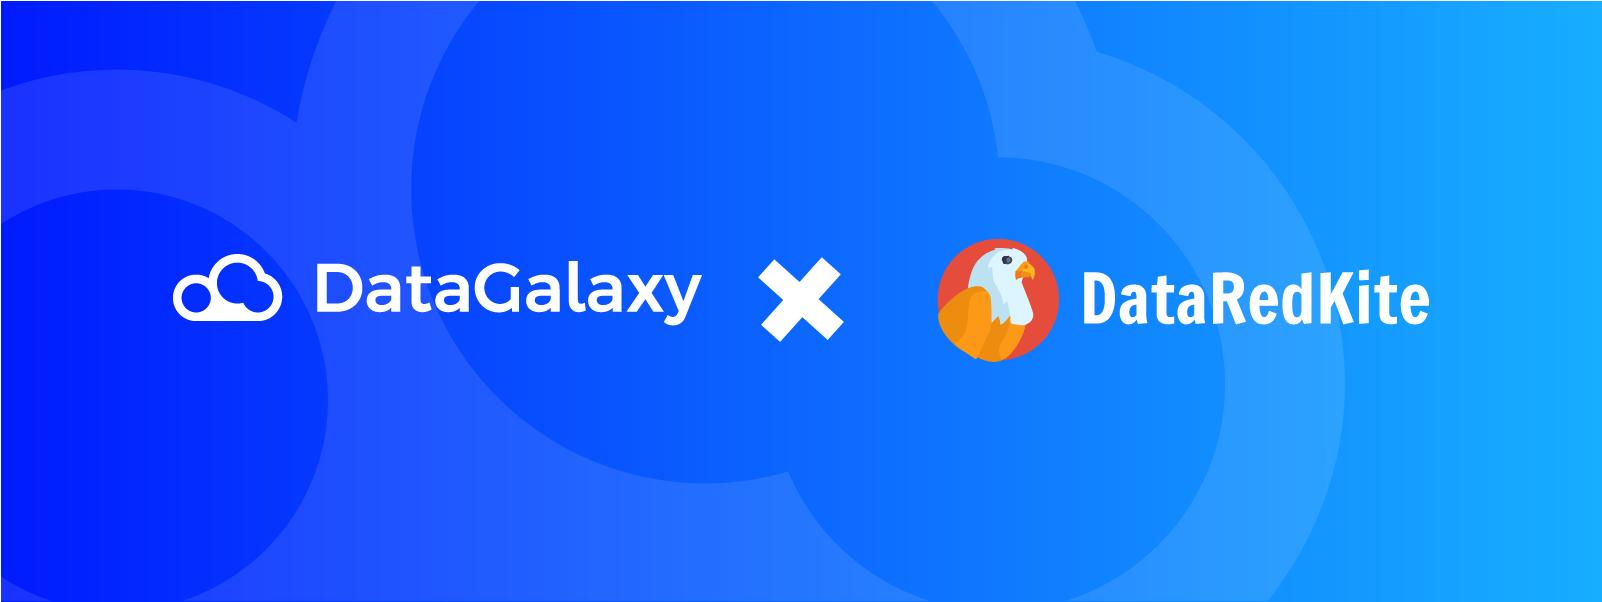 dataredkite-datagalaxy